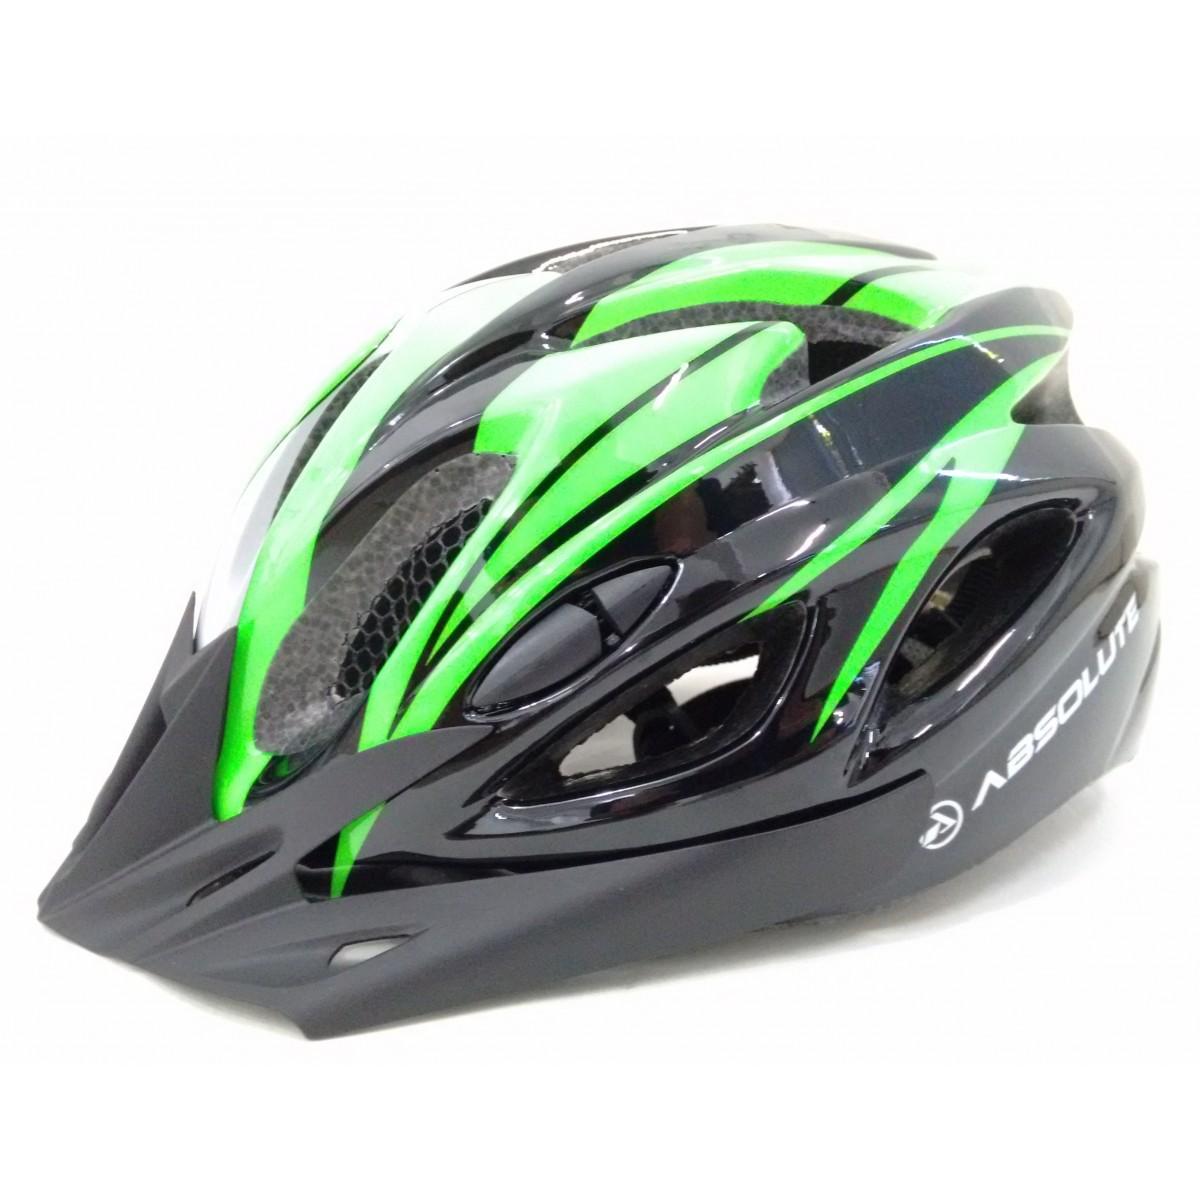 Capacete MTB Ciclismo Absolute com Led Traseiro